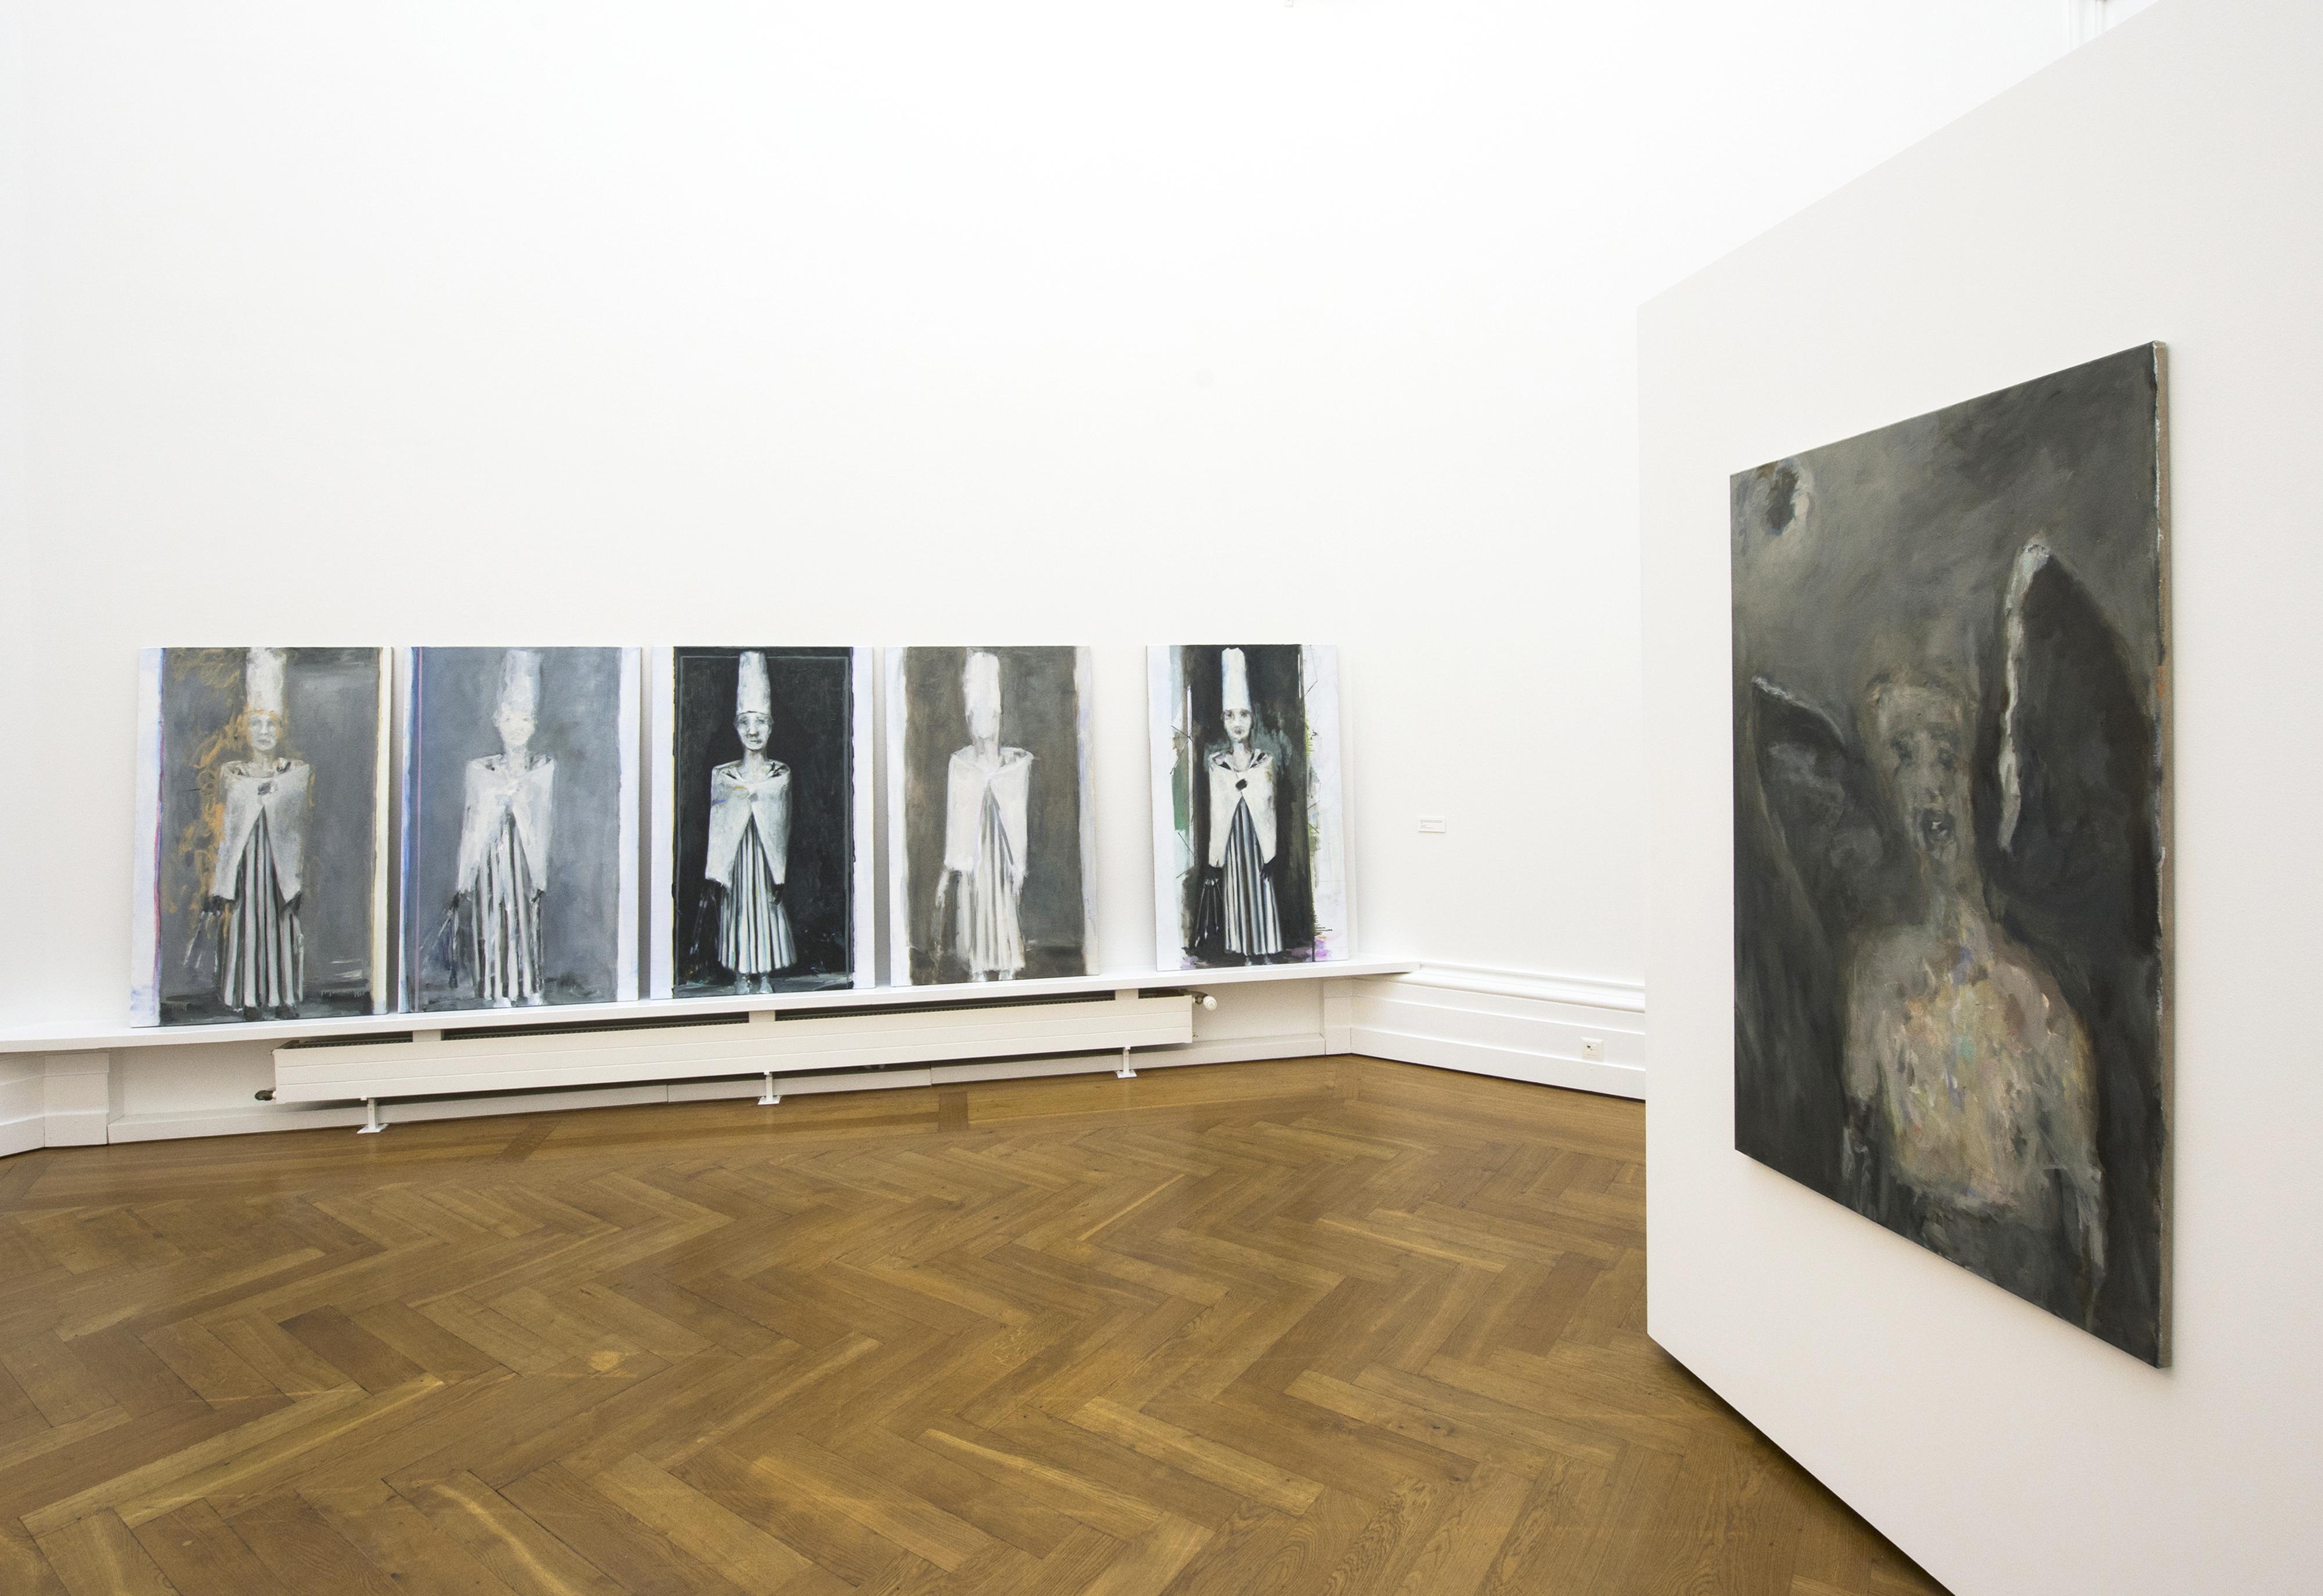 Galerie Barbara Thumm \ Valérie Favre – Une exposition monographique